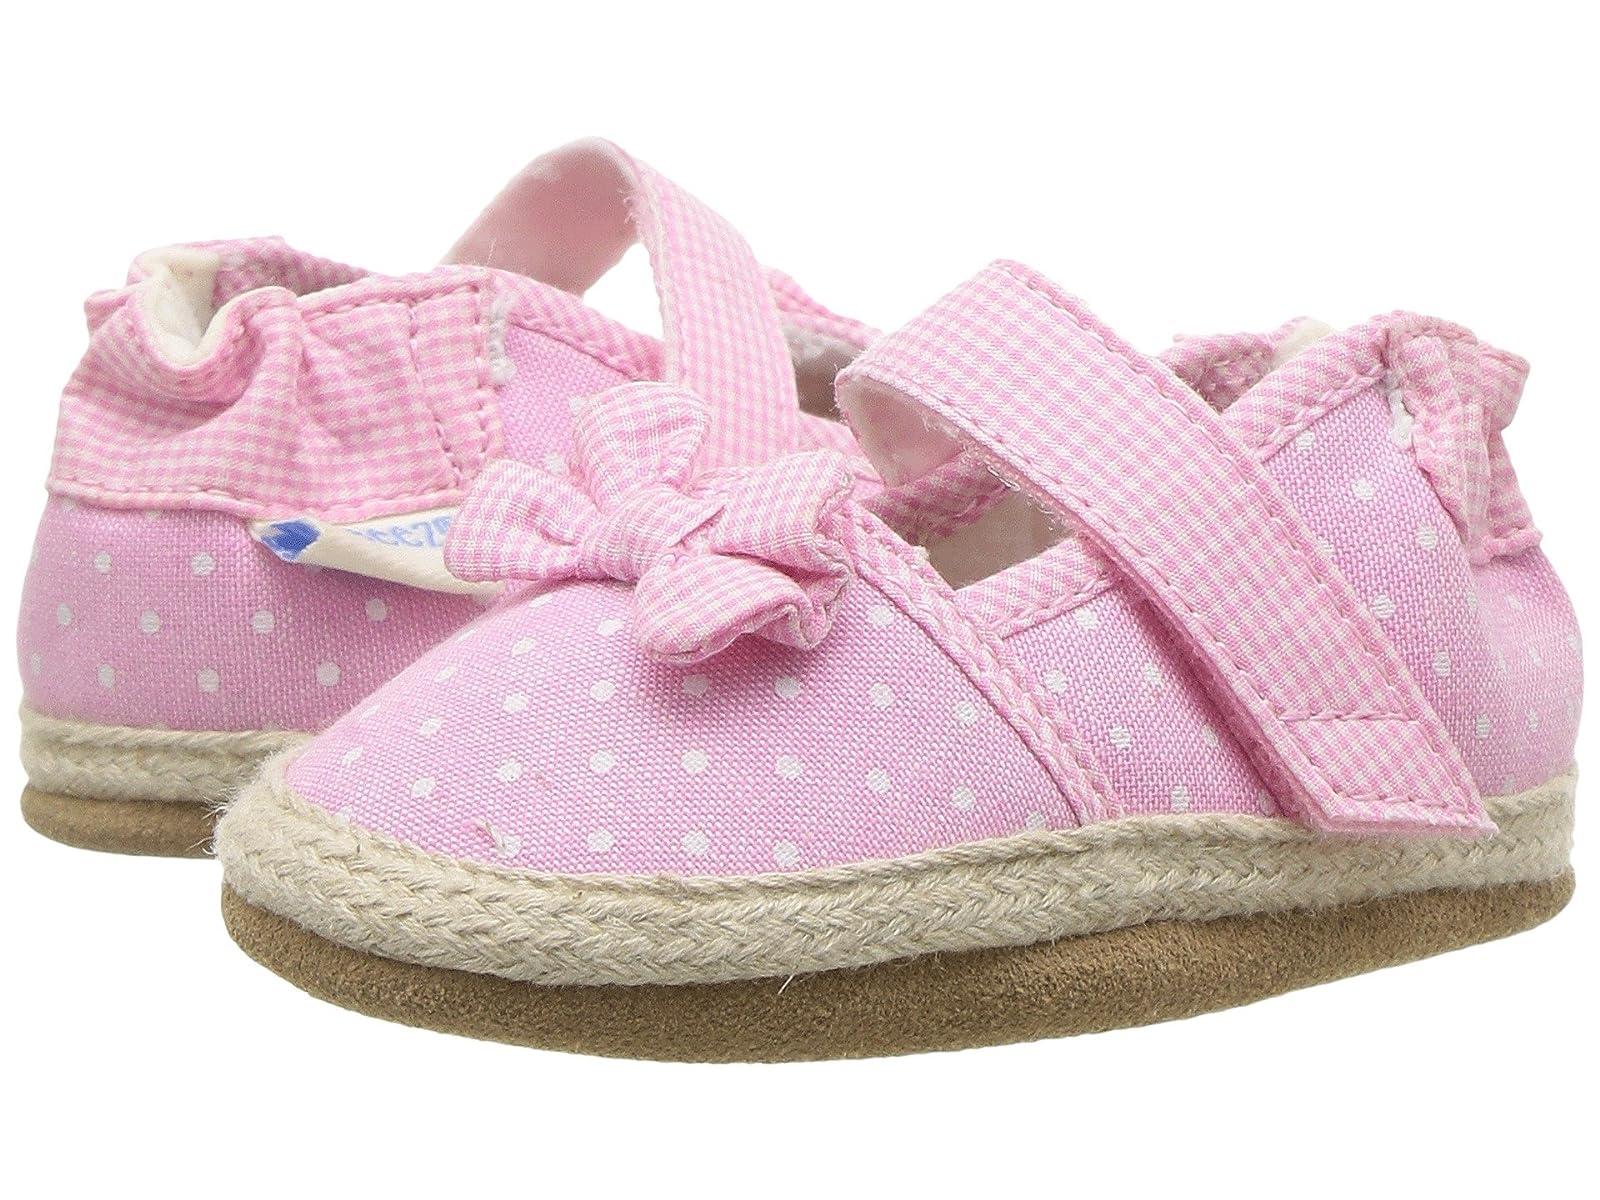 Robeez Buttercup Espadrille Soft Sole (Infant/Toddler)Atmospheric grades have affordable shoes